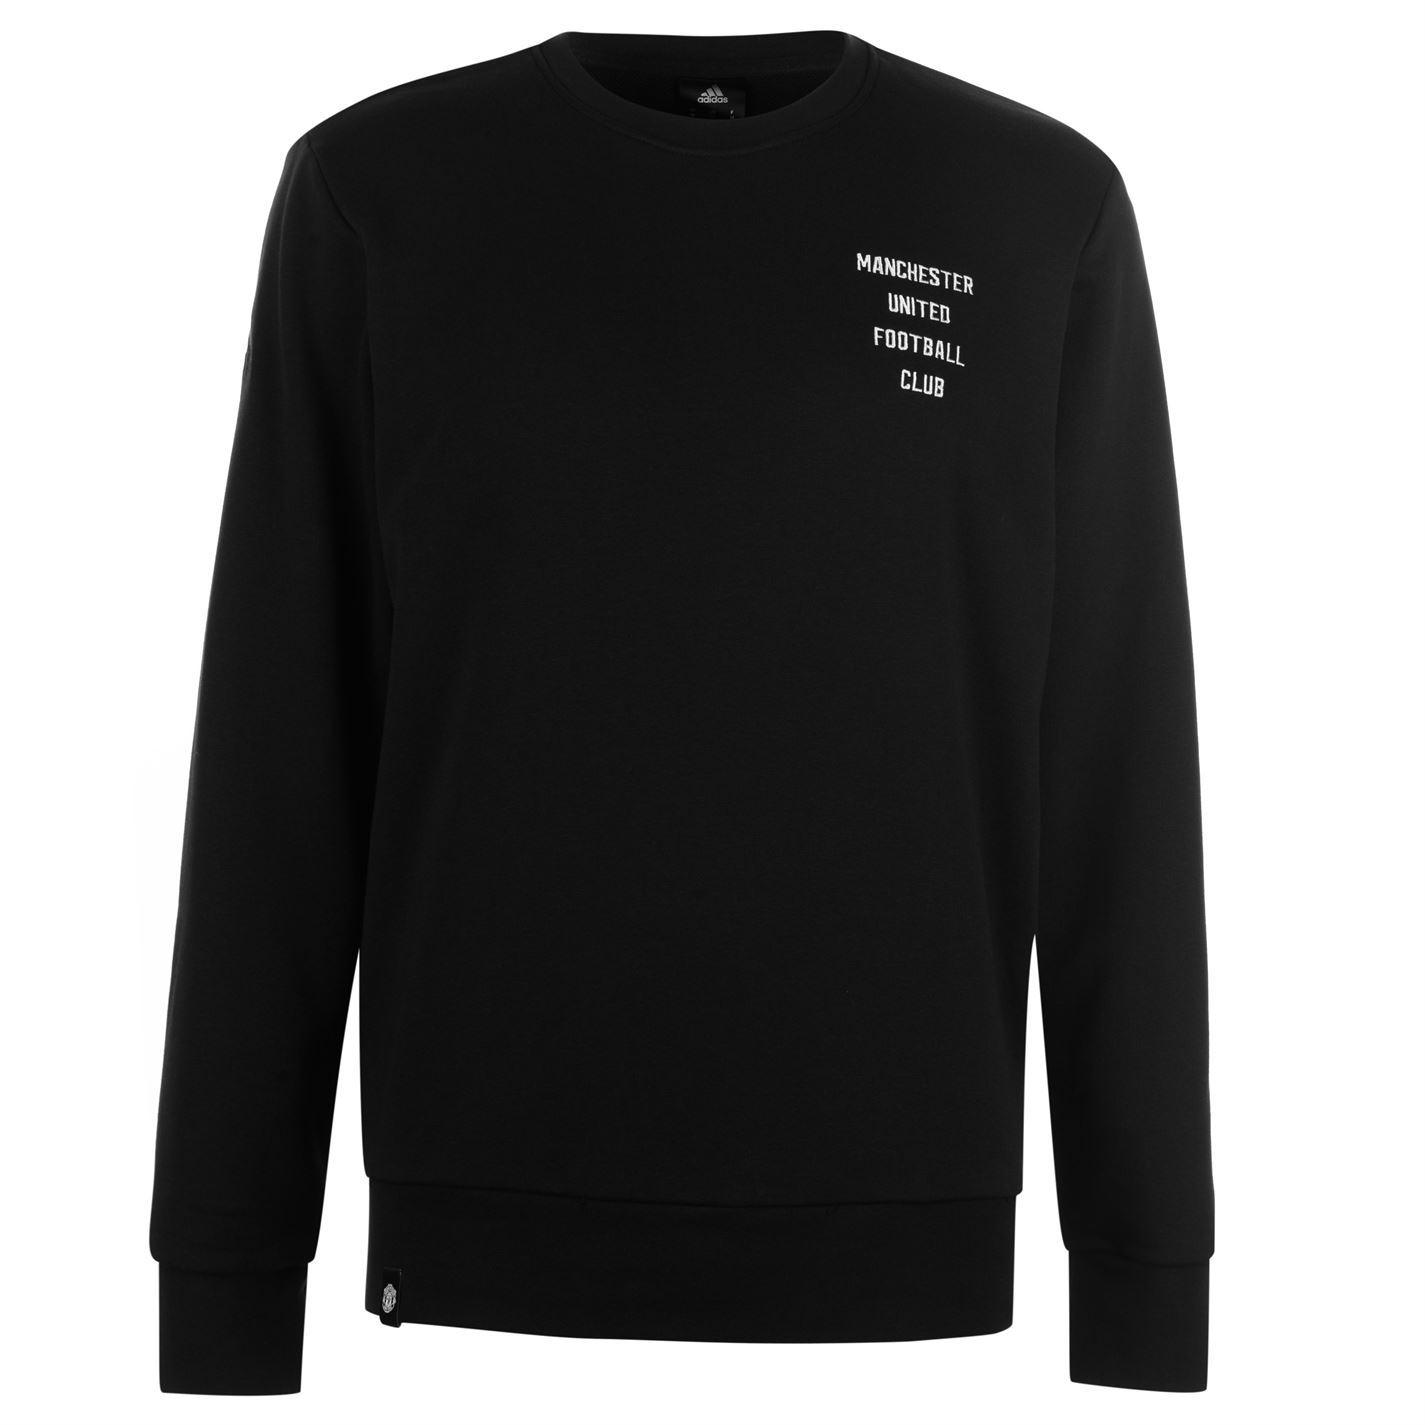 f0f0d2b1b61 adidas Manchester United SGR Sweatshirt Mens Black Football Soccer Track  Sweater